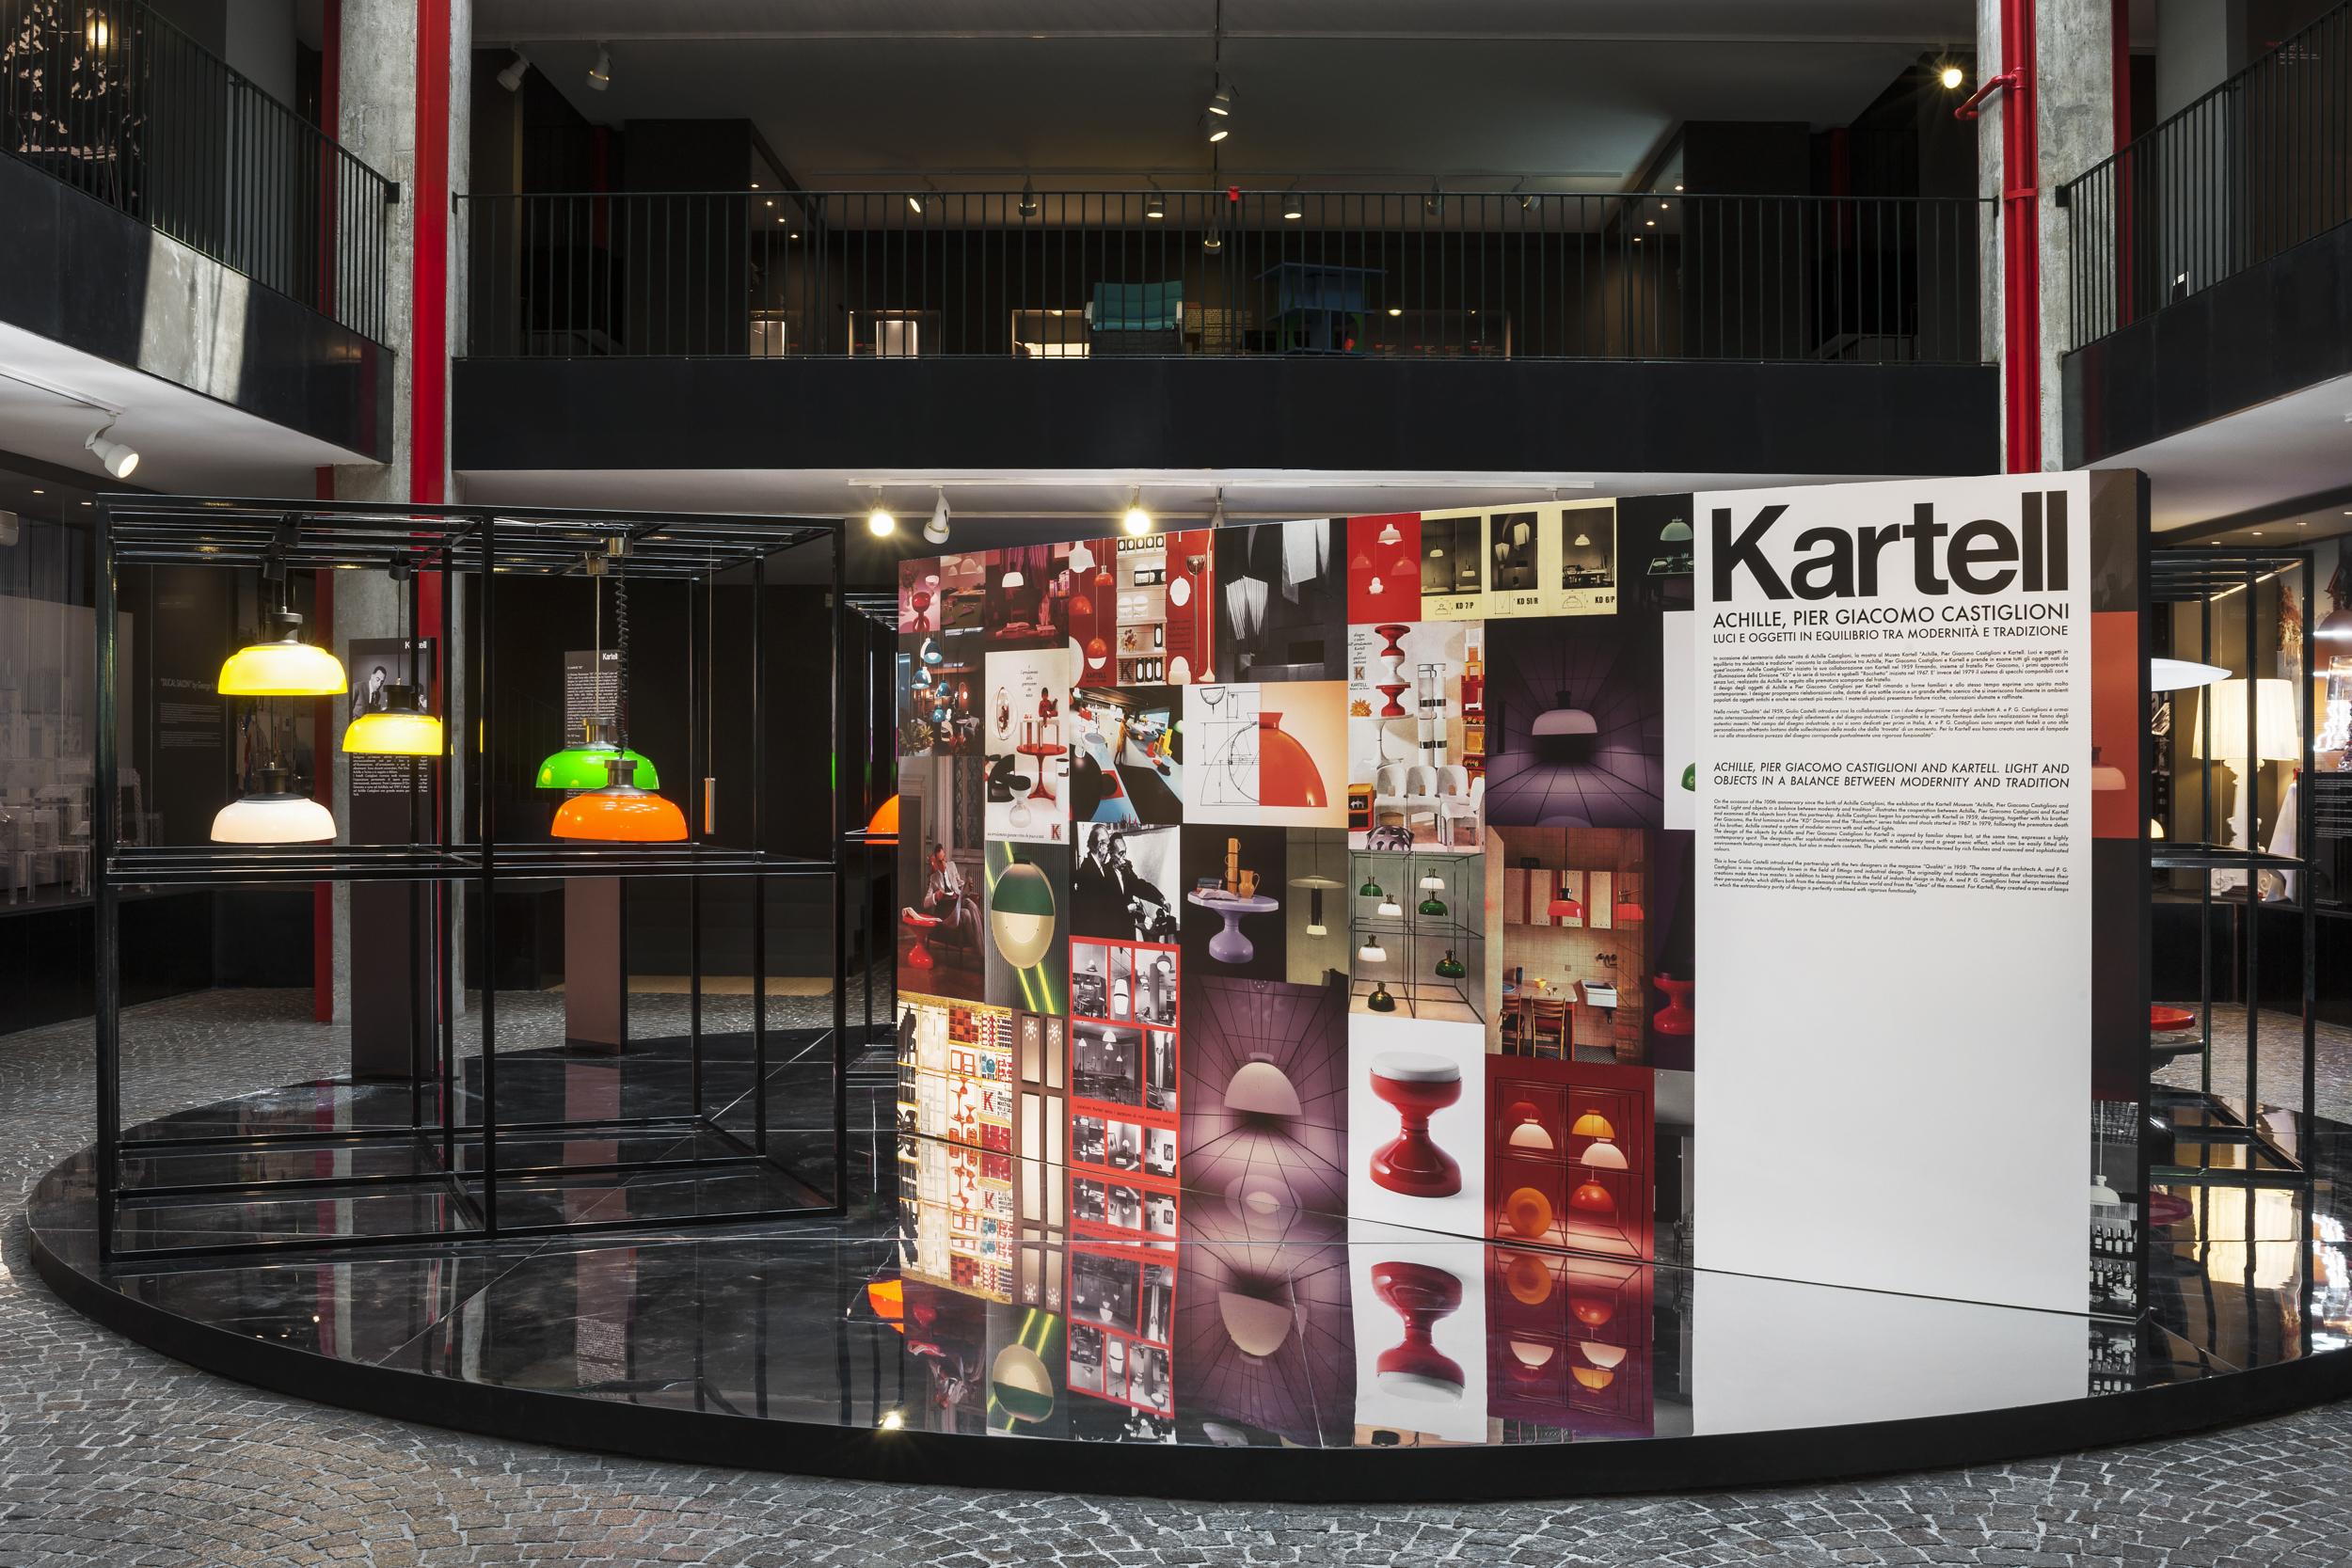 The Kartell Museum's tribute to designer Achille Castiglioni and his brother Per Giacomo.